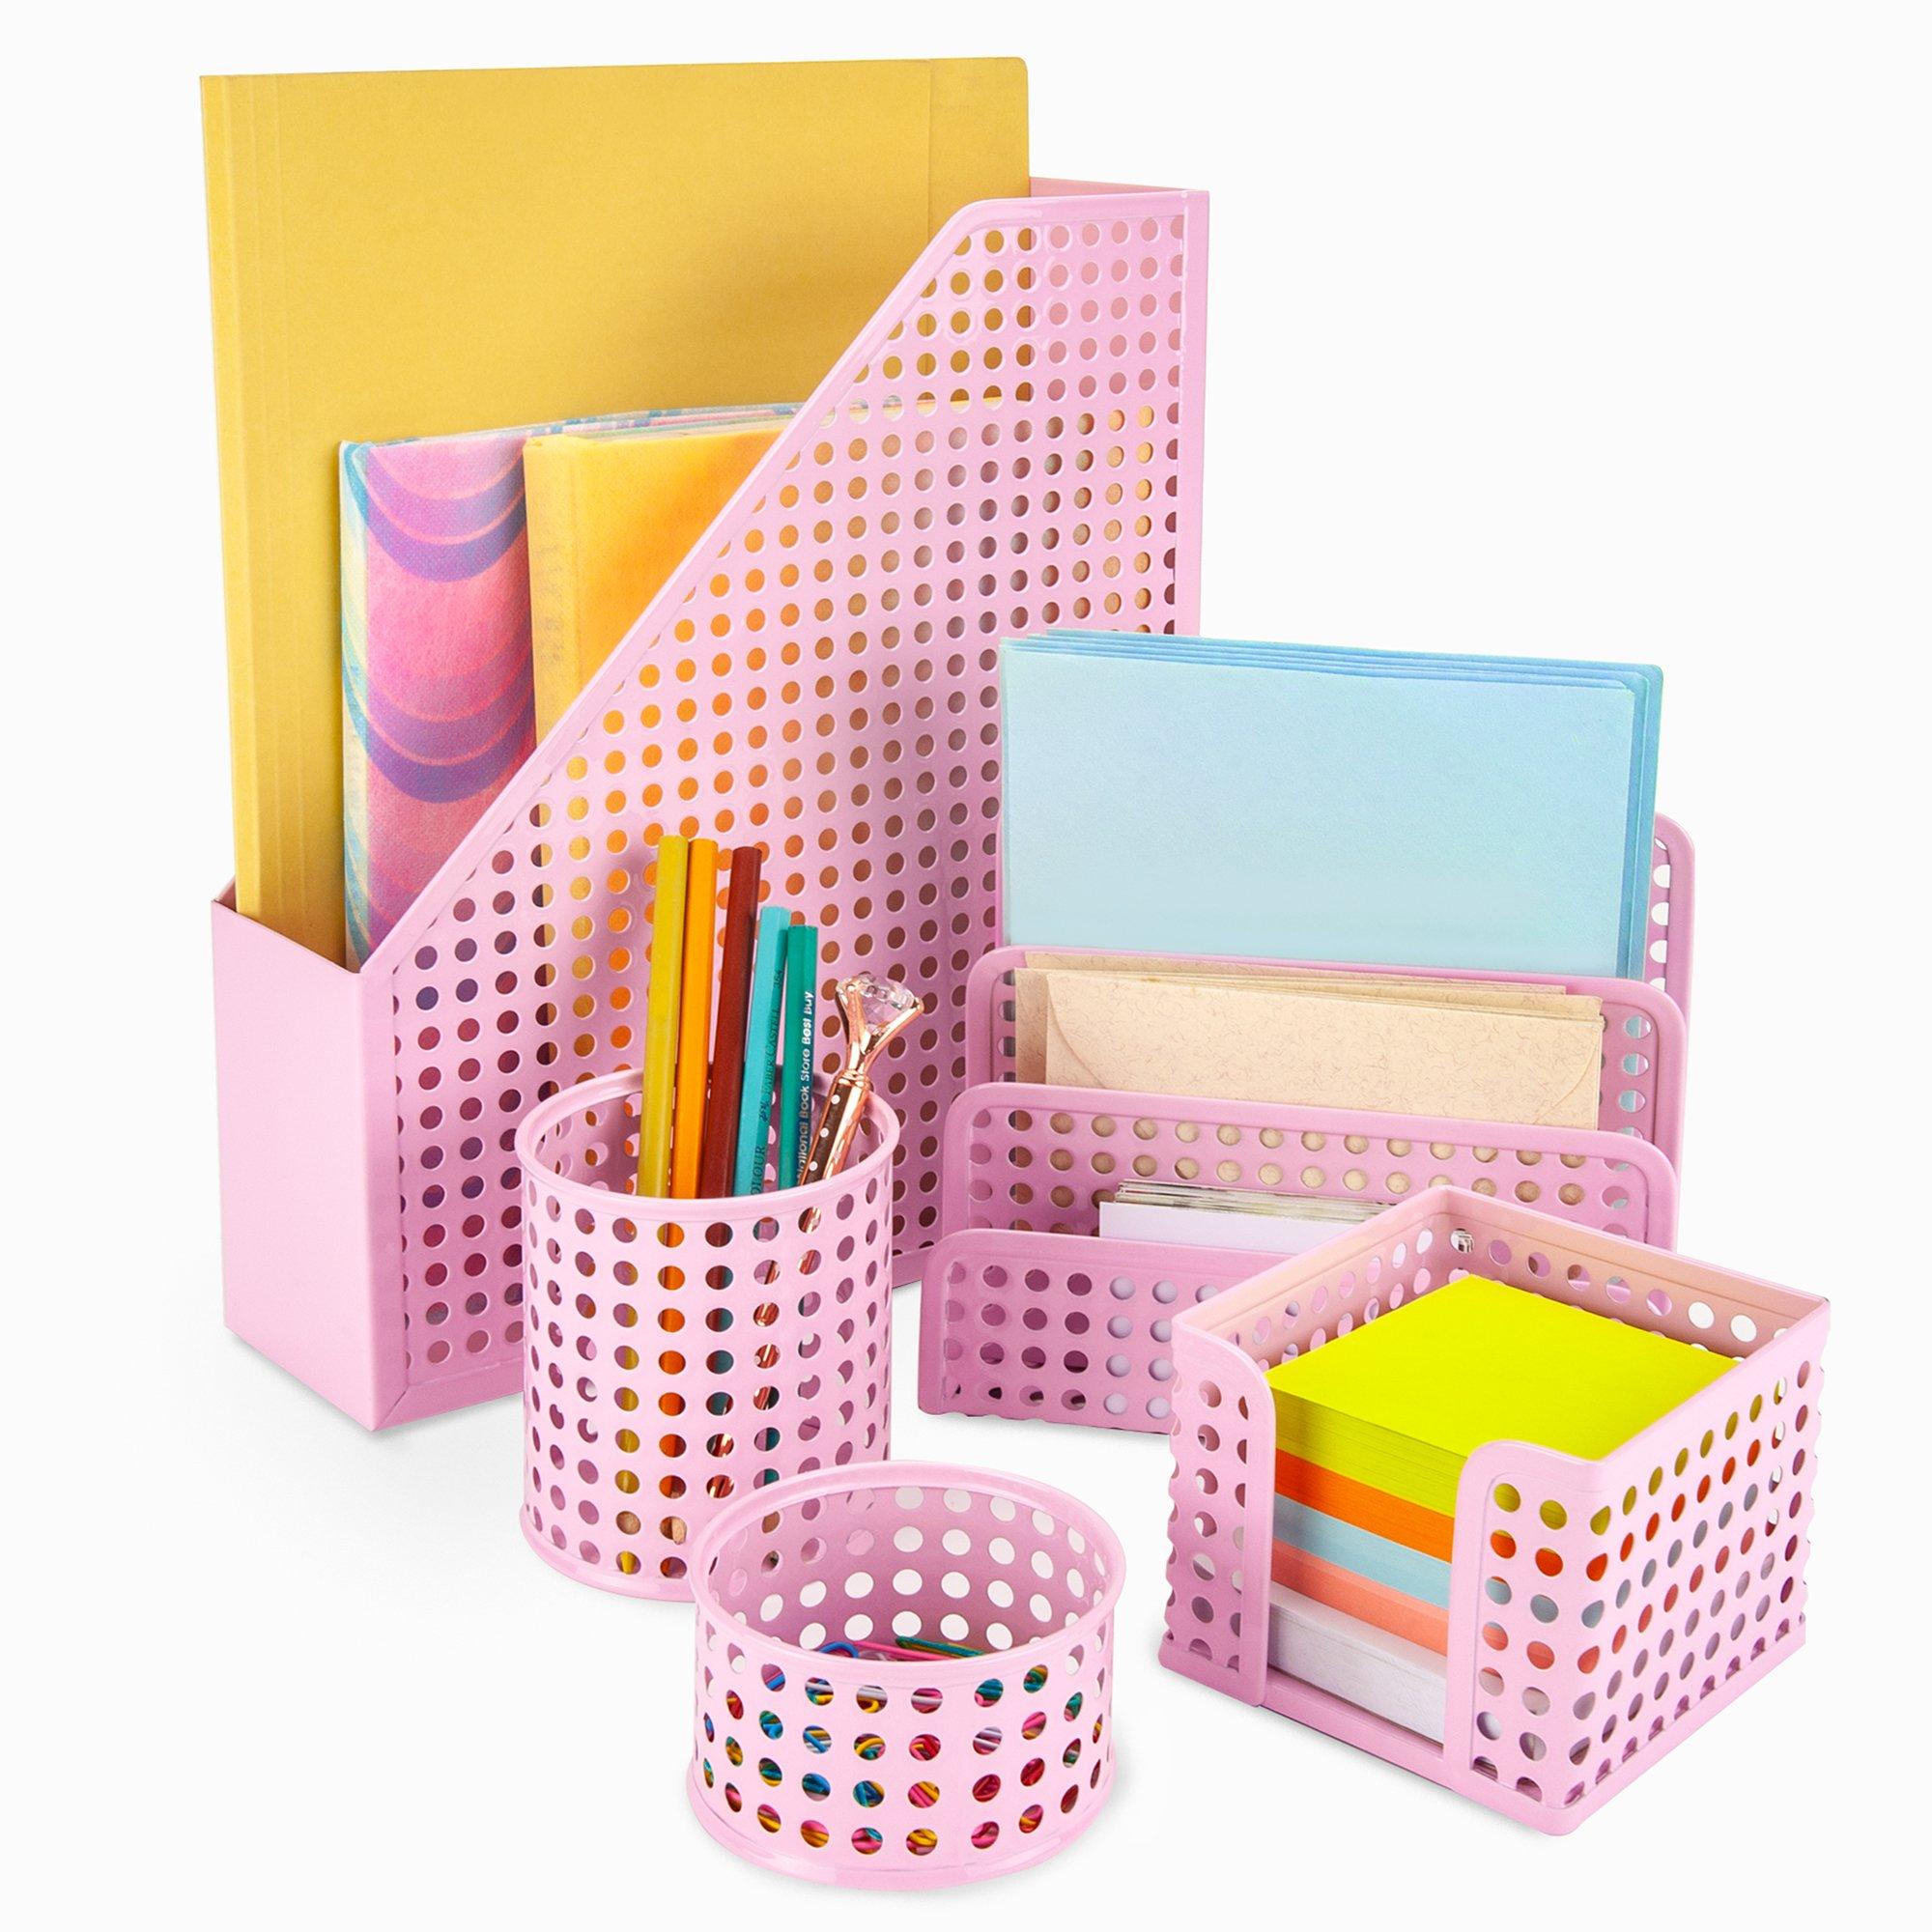 Generic Office Desk Tidy 38 Piece Set Letter Sorter Rack,Makeup